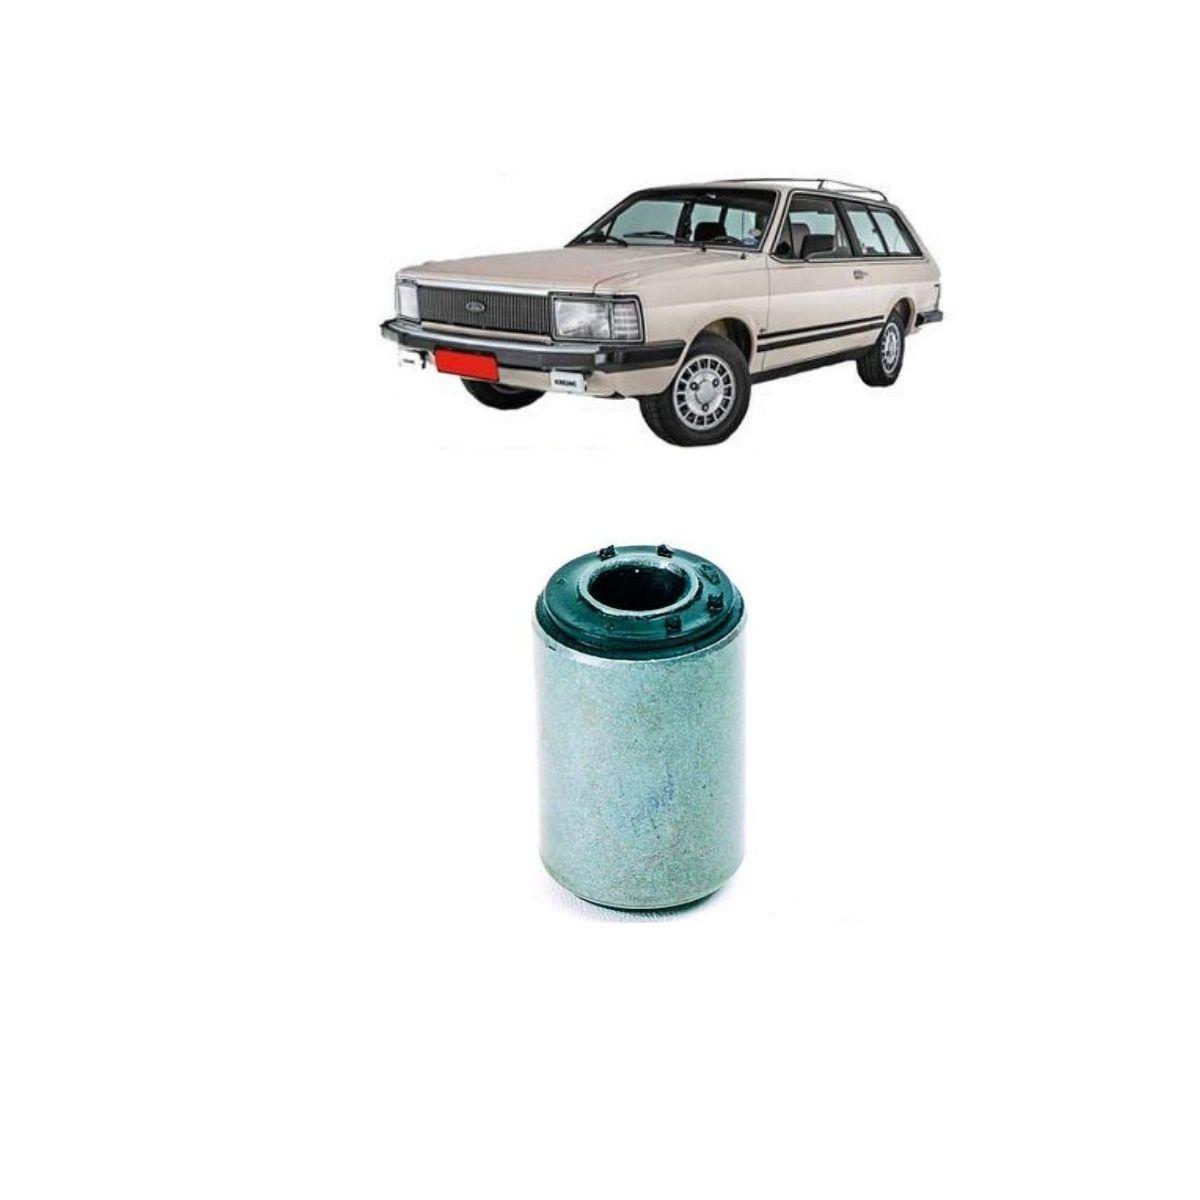 Bucha Bandeja Dianteira Direita Superior Ford Belina 81/84